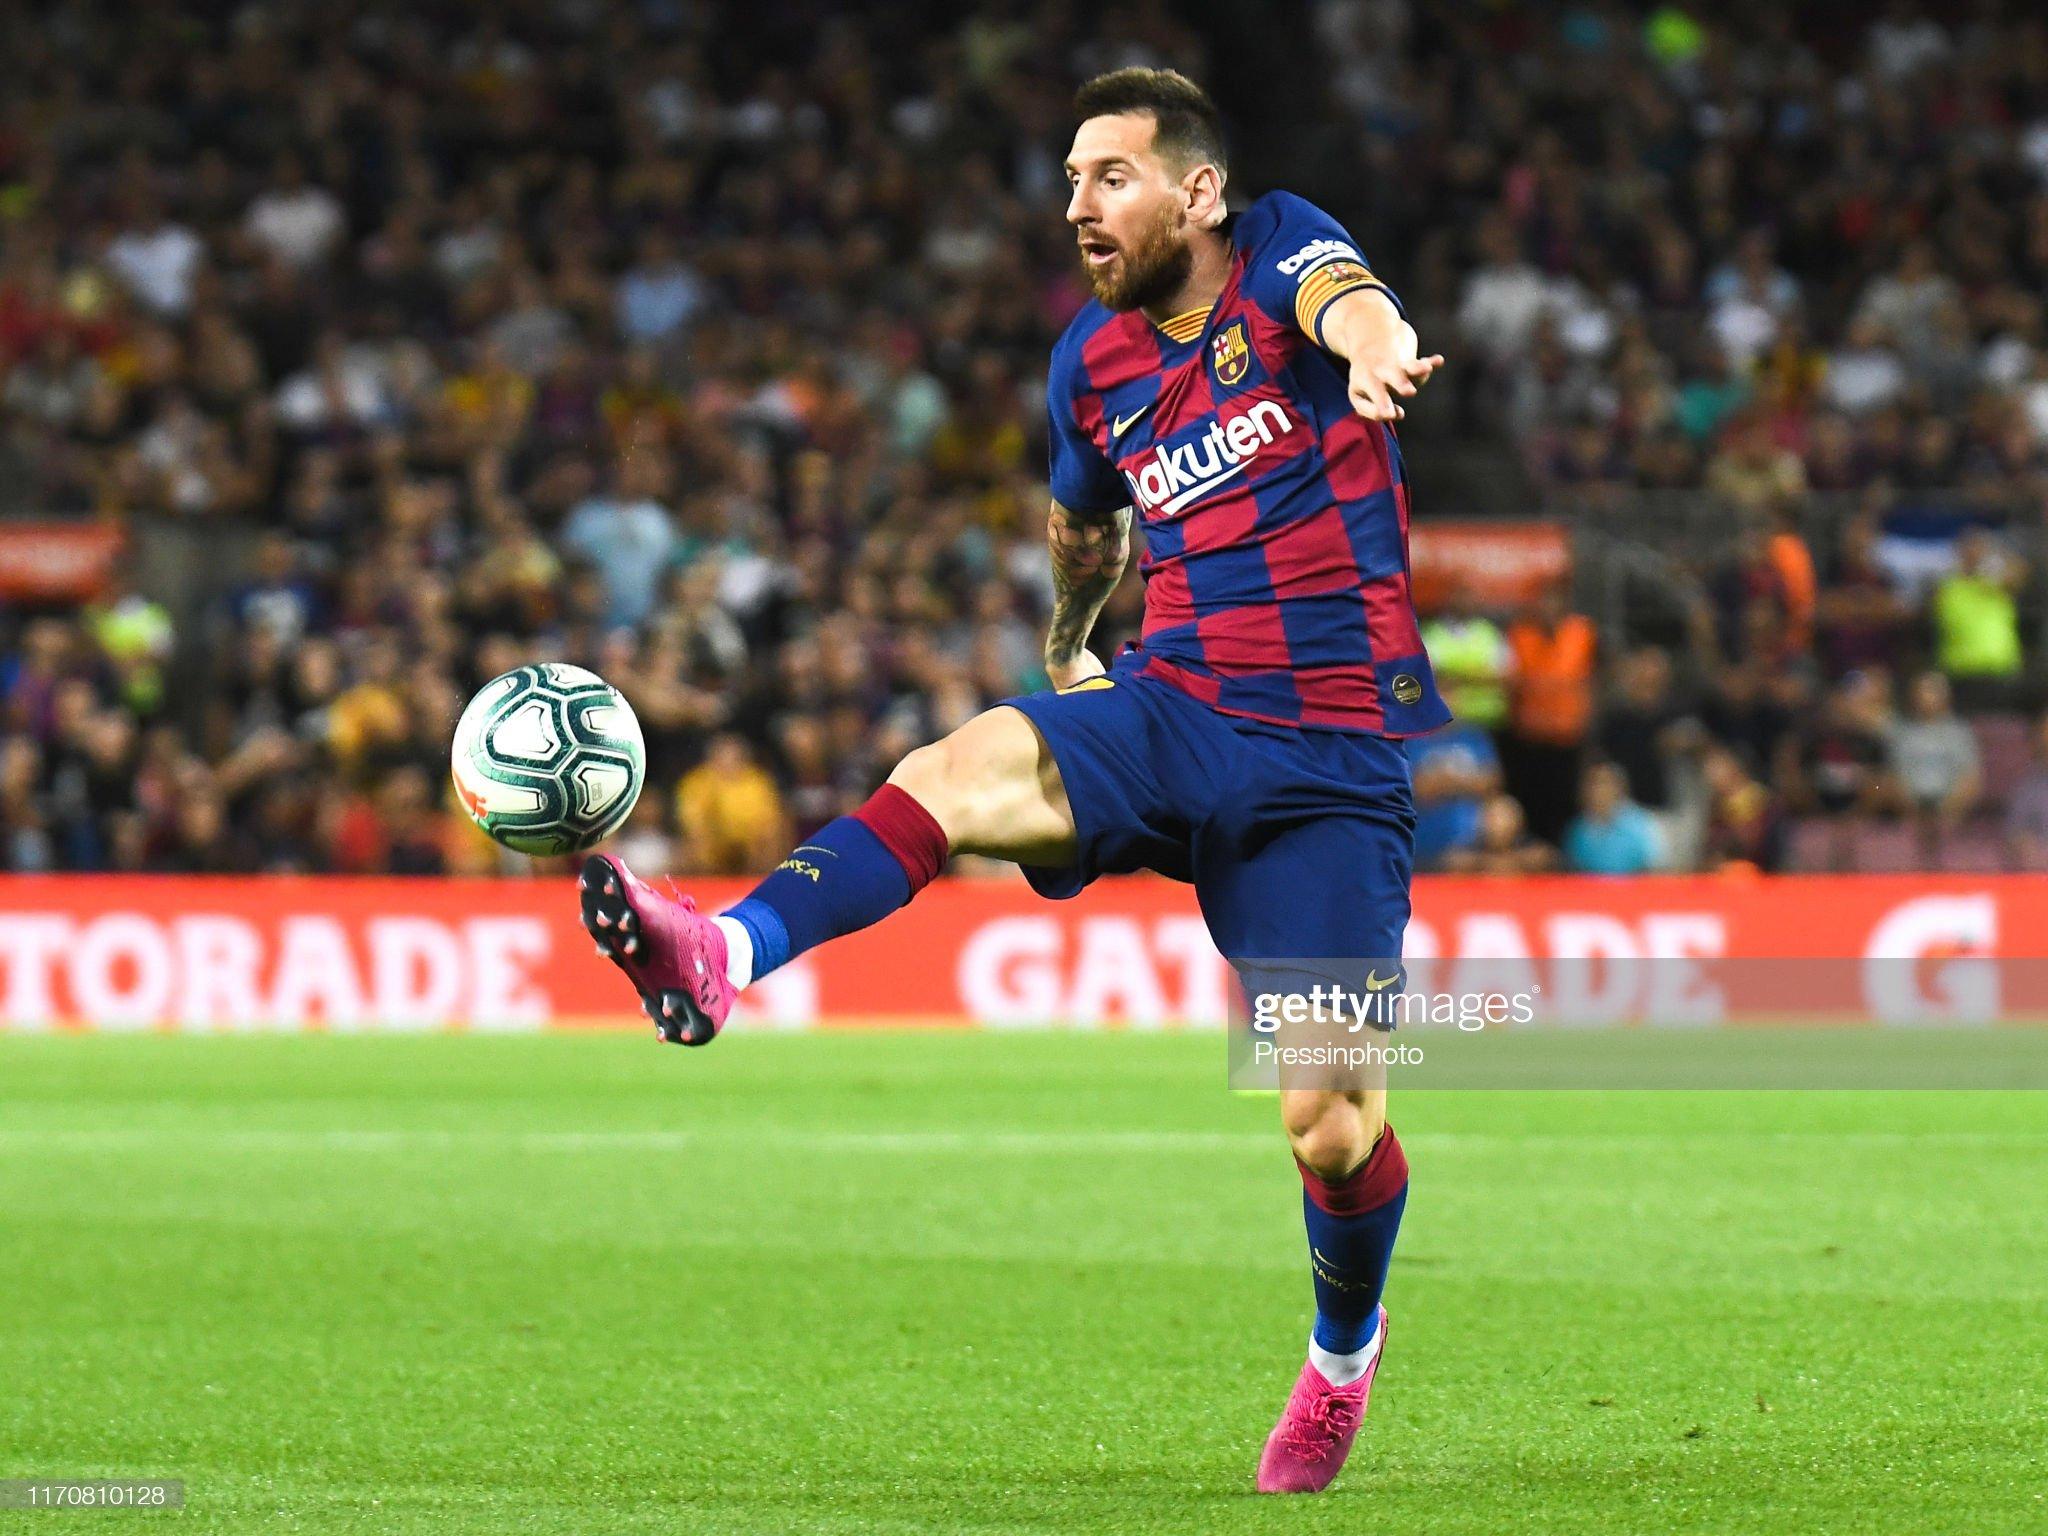 صور مباراة : برشلونة - فياريال 2-1 ( 24-09-2019 )  Lionel-messi-of-fc-barcelona-during-the-liga-match-between-barcelona-picture-id1170810128?s=2048x2048